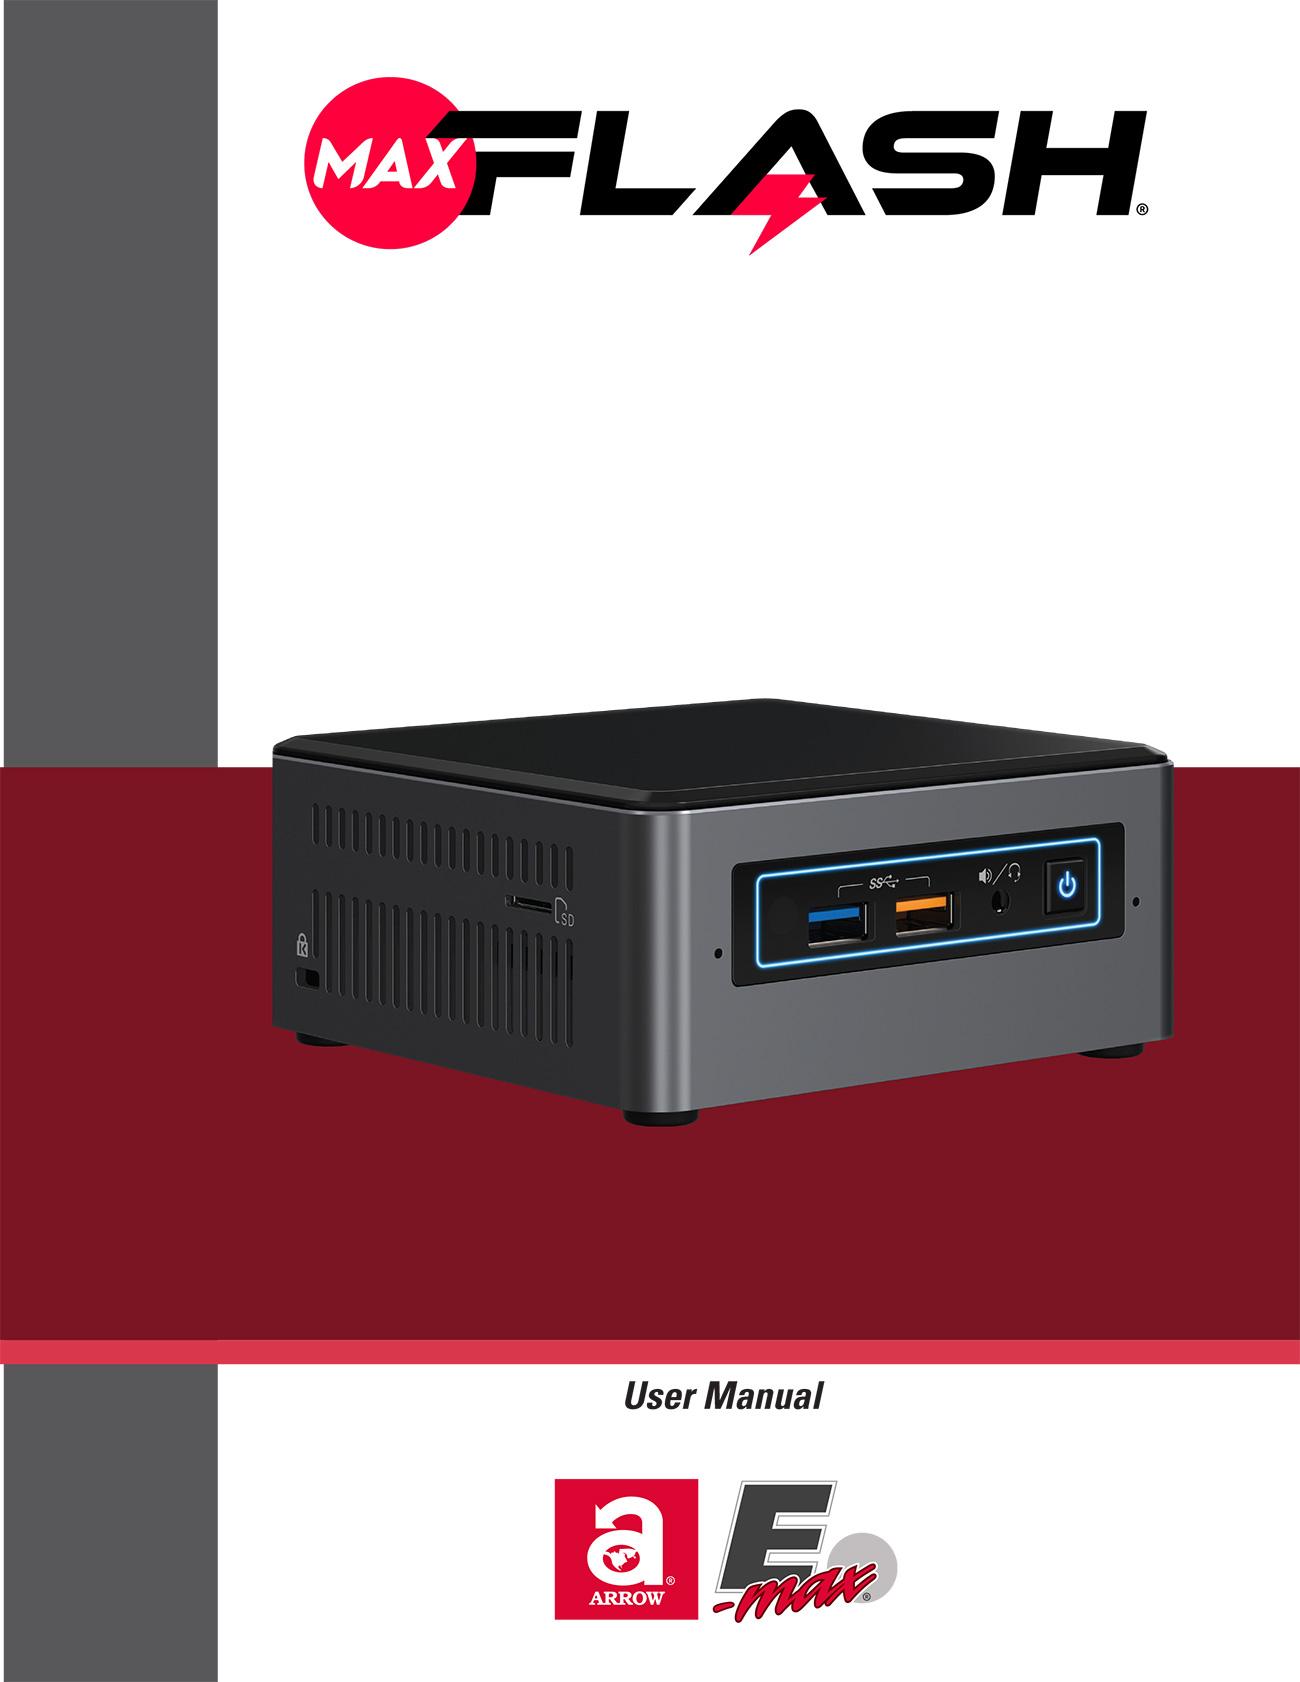 MaxFlash User Manual Promotional Materials/Equipment Flyers & Brochures